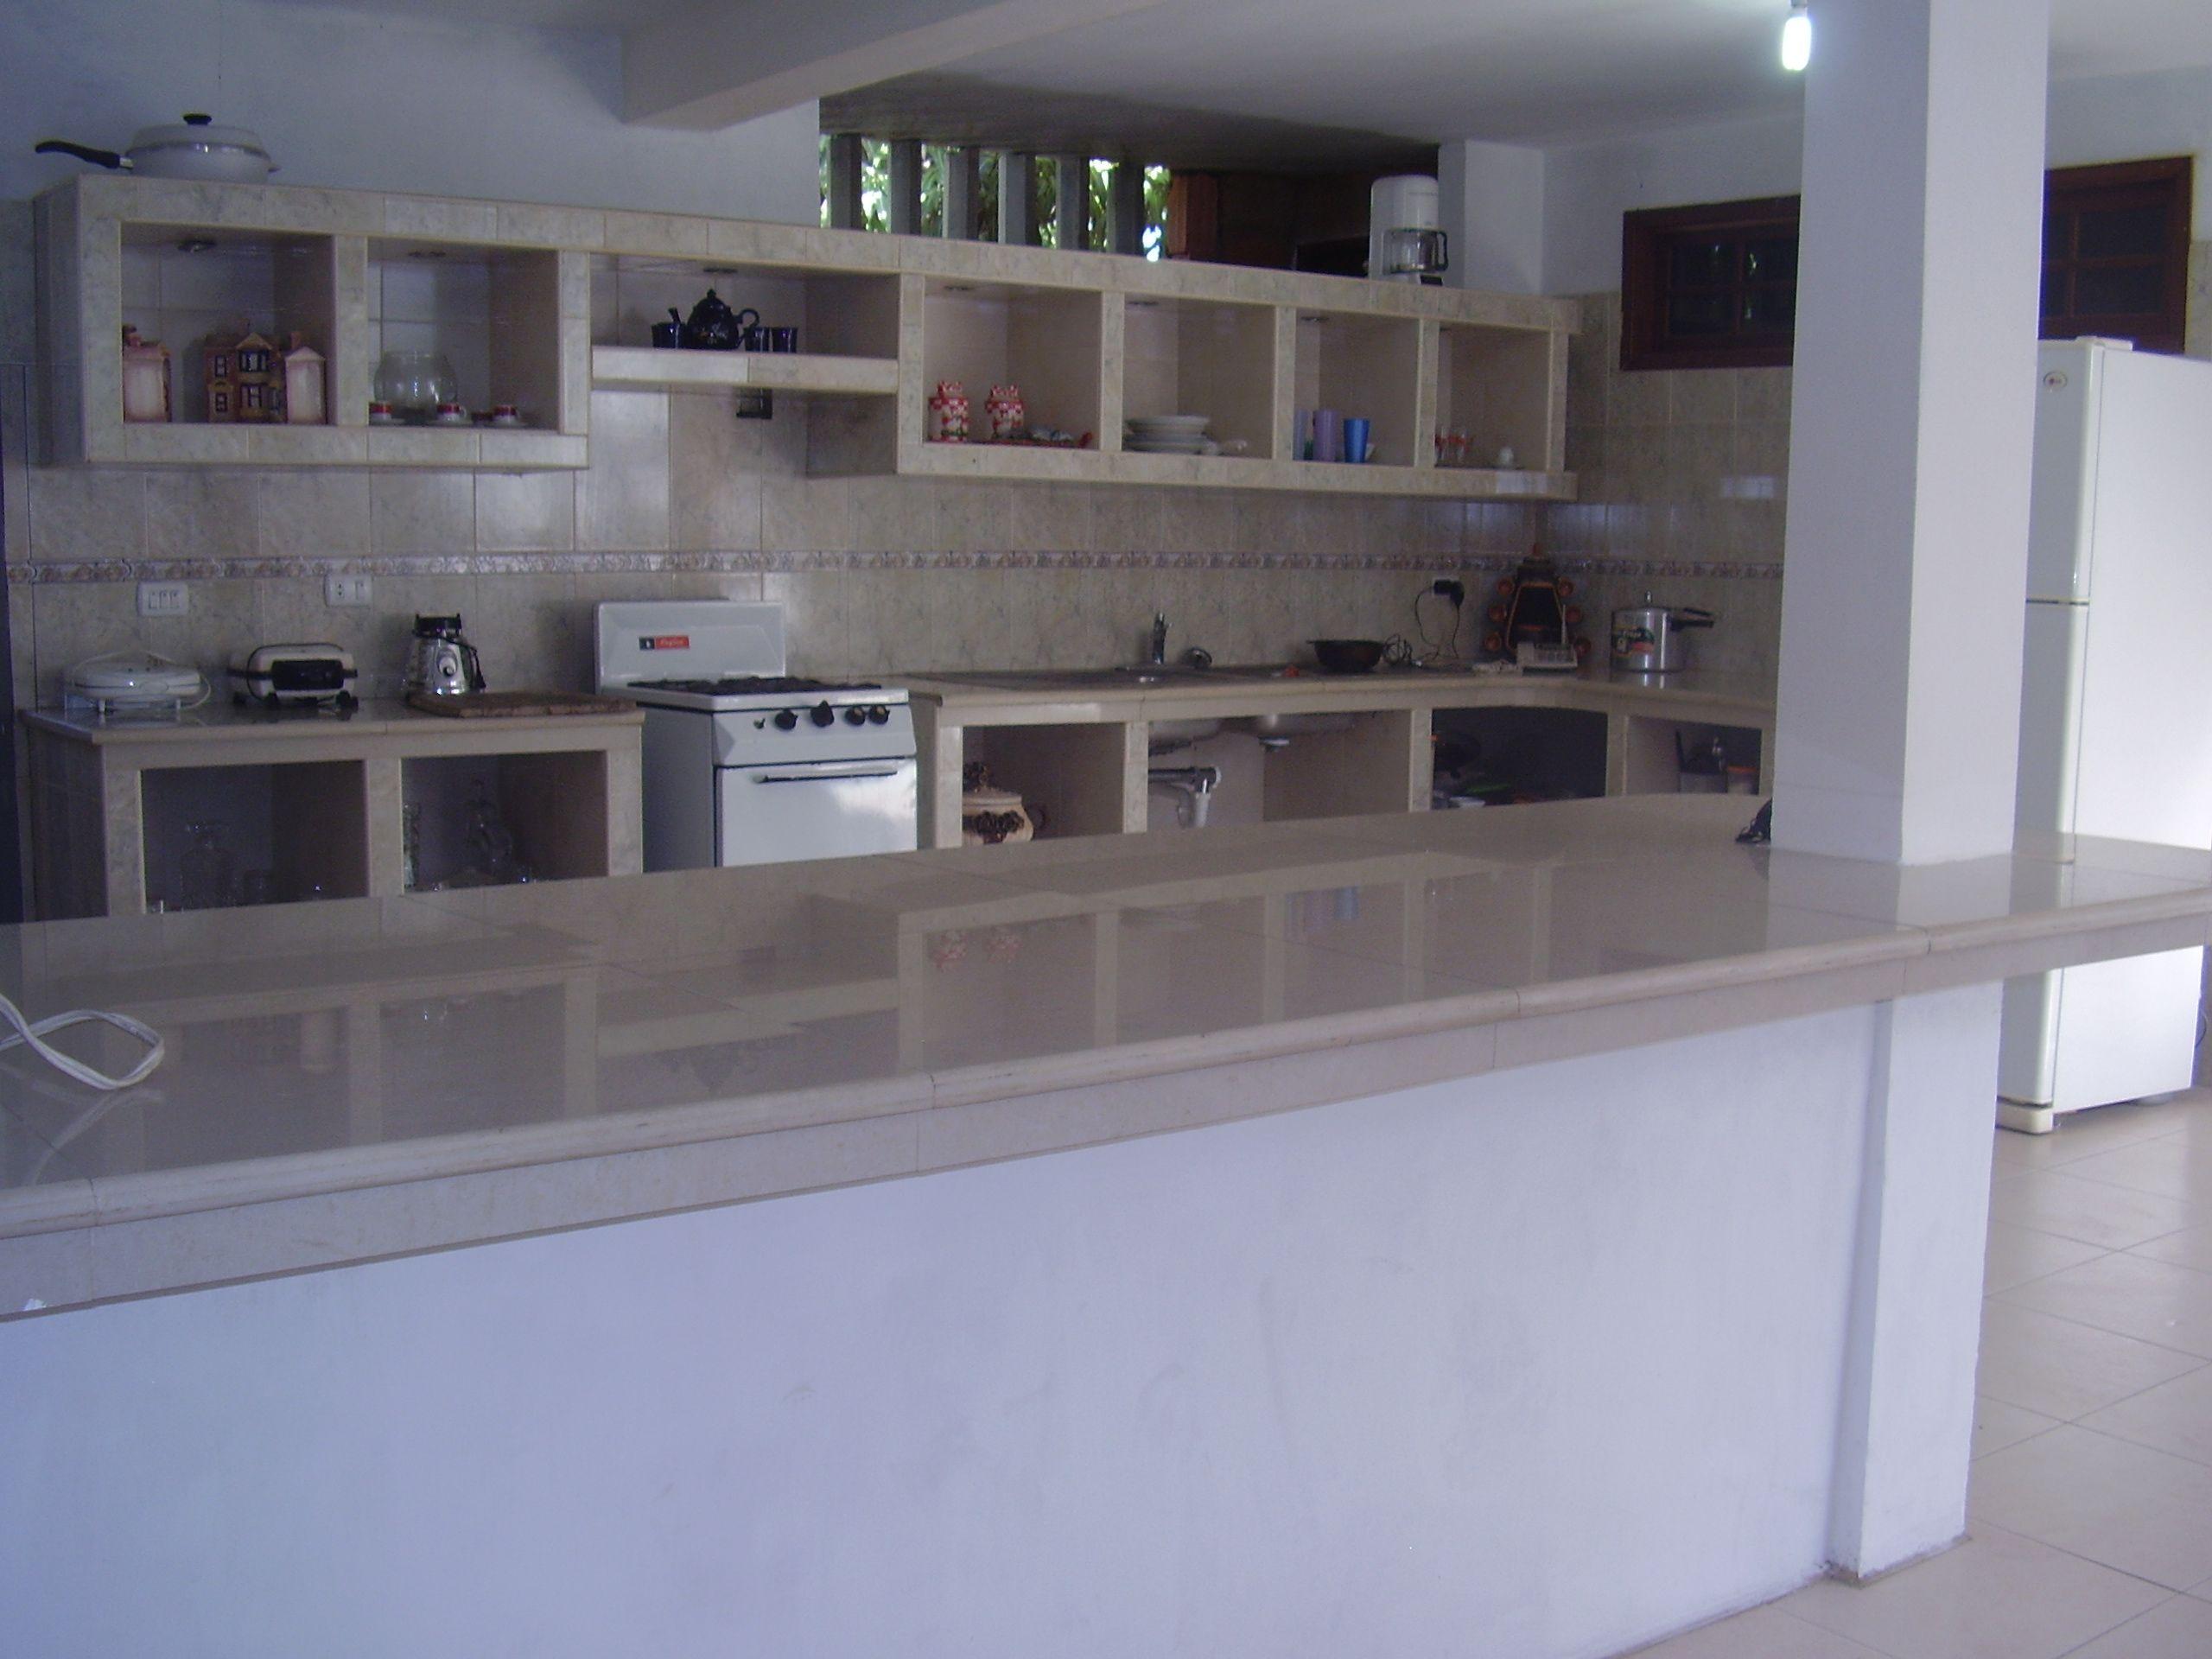 Vendo casa en urb san jacinto sector 12 vereda anuncia for Cocinas integrales de concreto pequenas